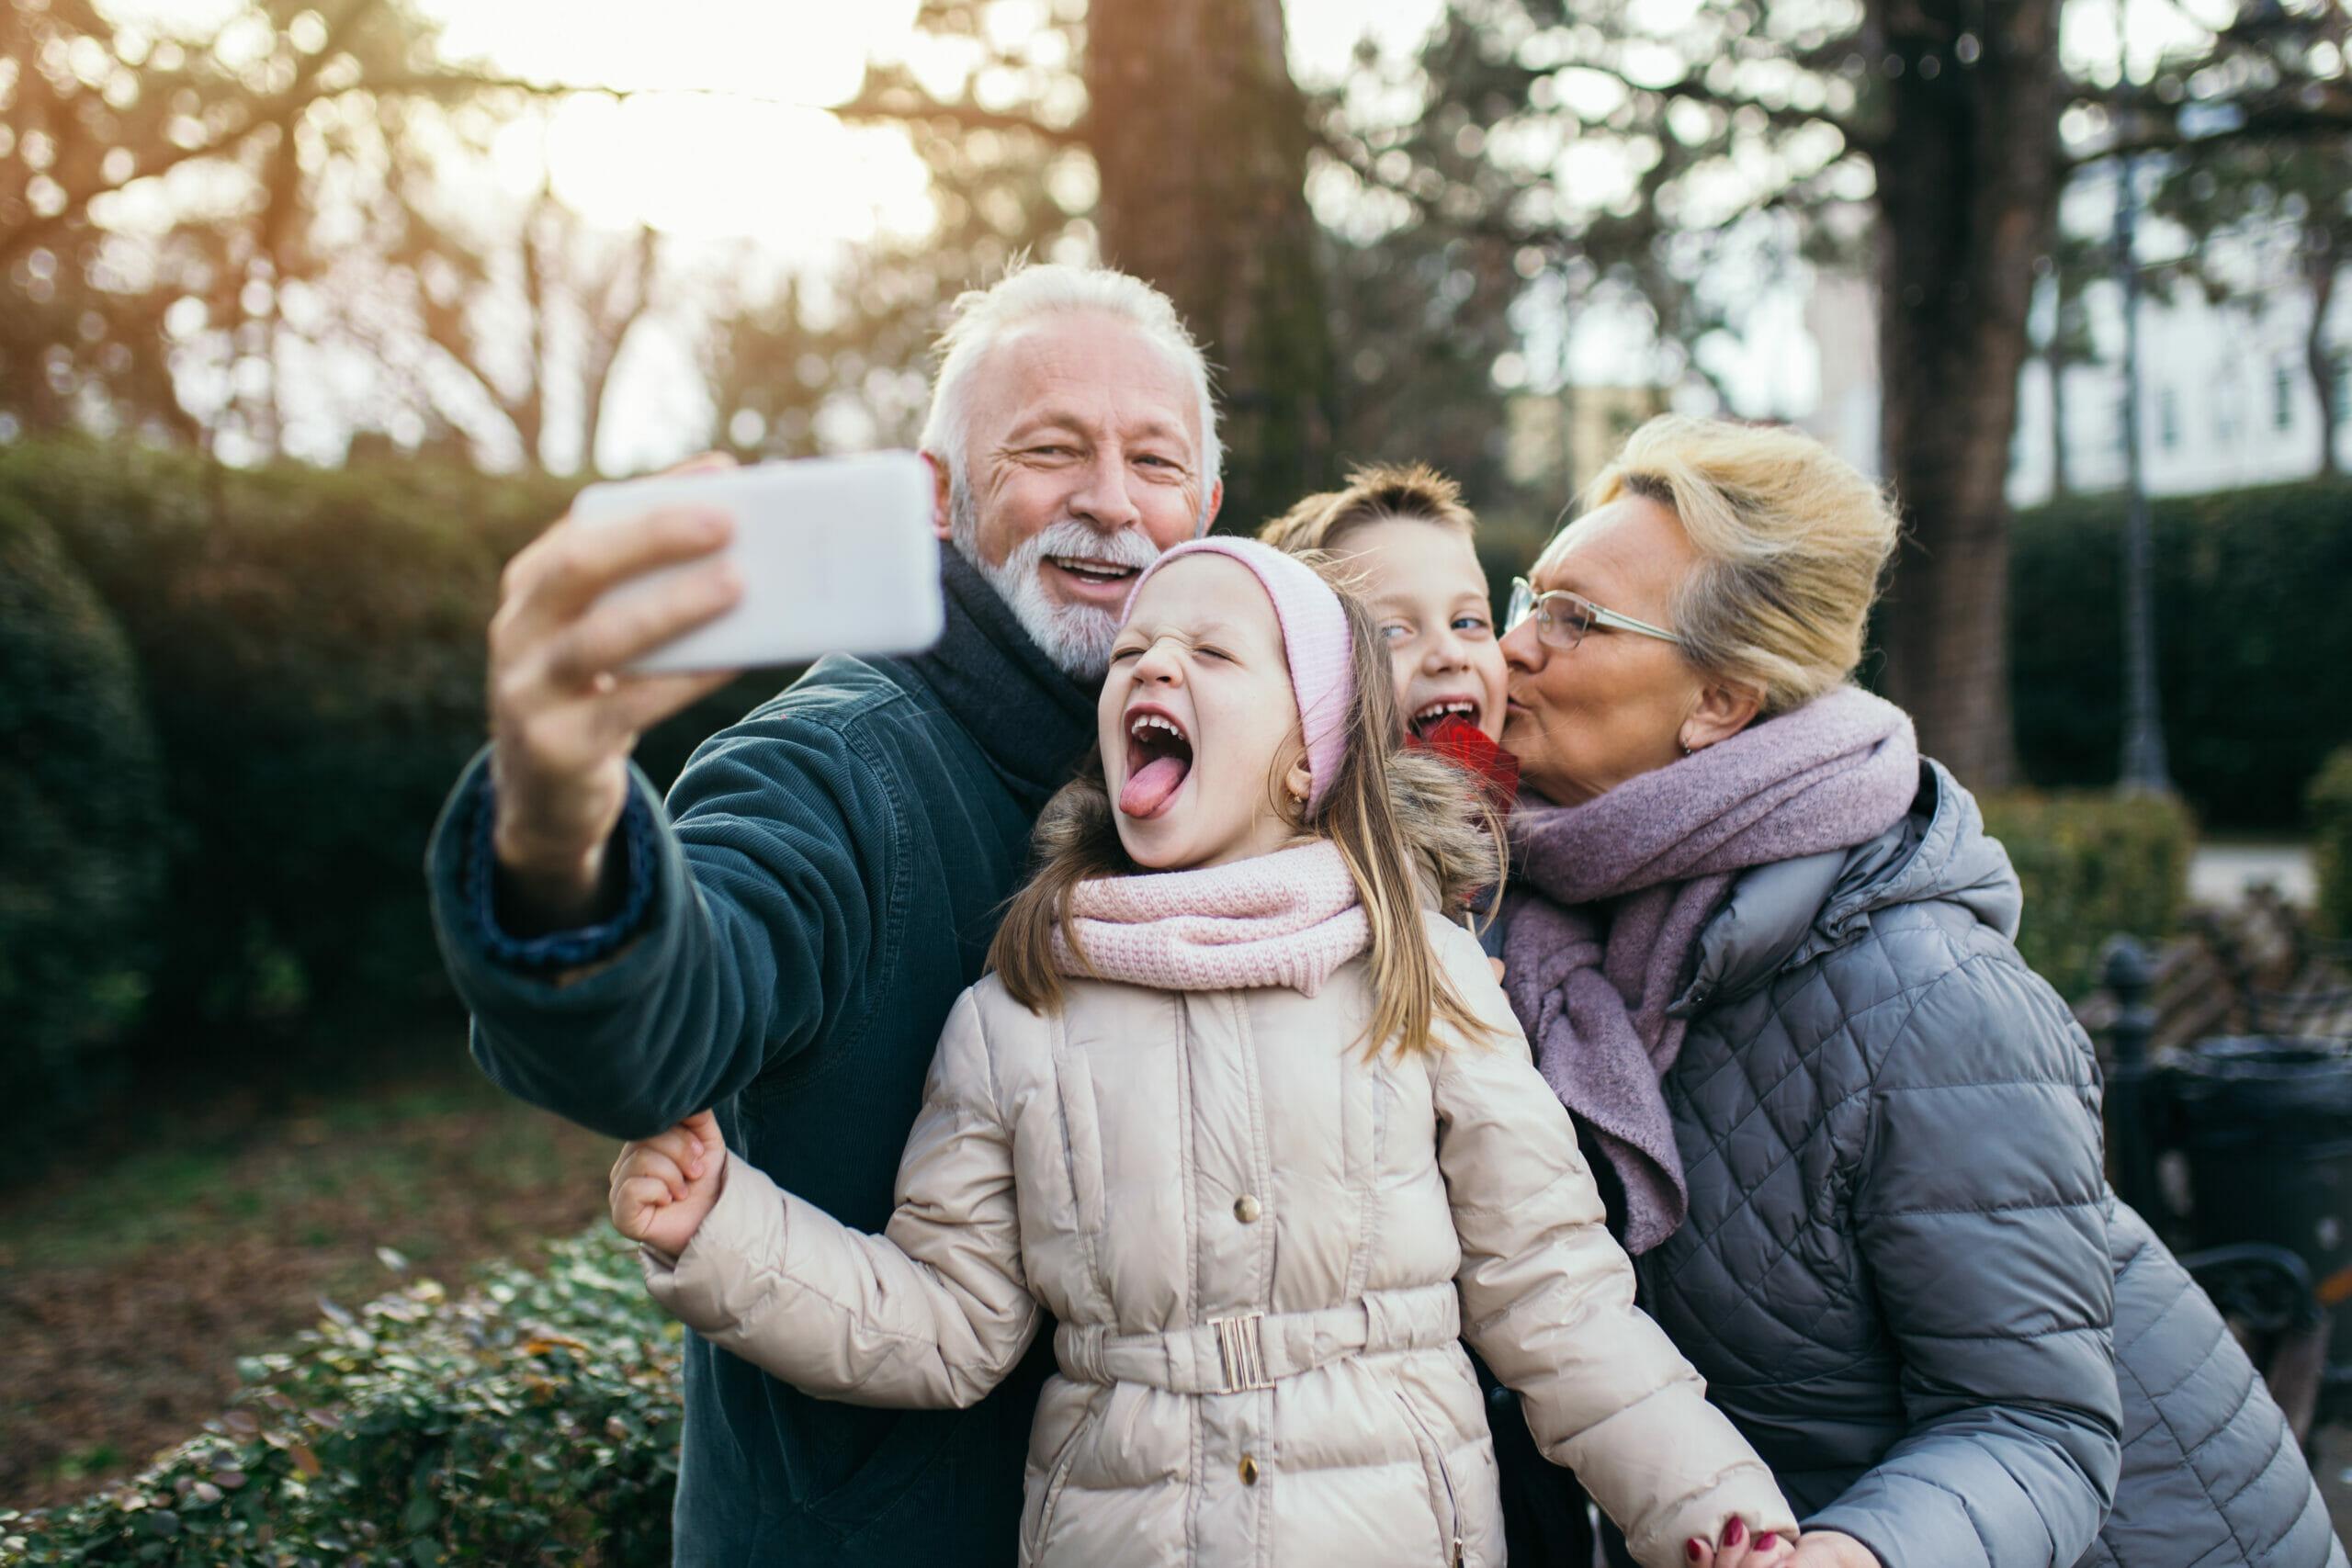 Grandparents taking a selfie with grandkids